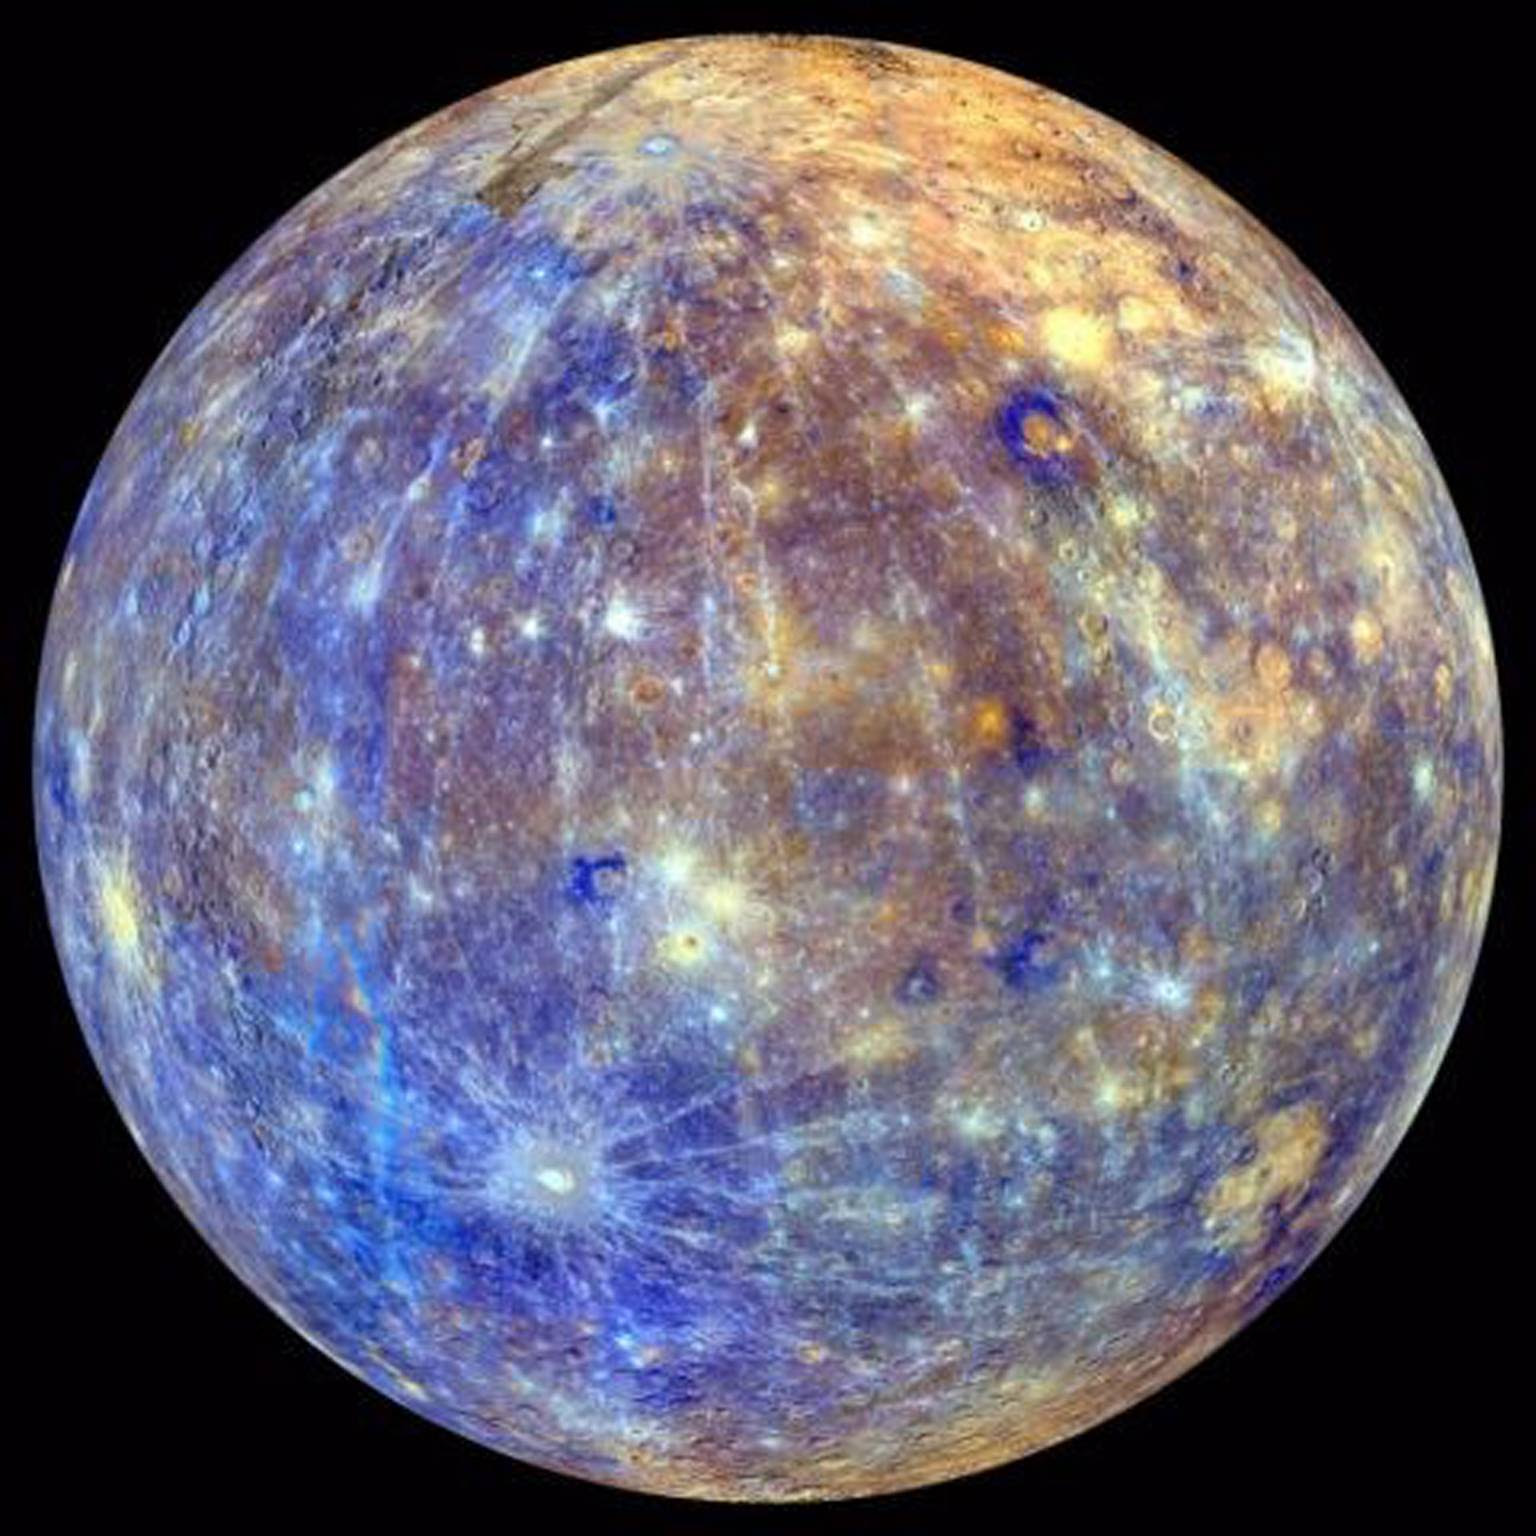 http://www.nasa.gov/sites/default/files/thumbnails/image/mercury.jpg